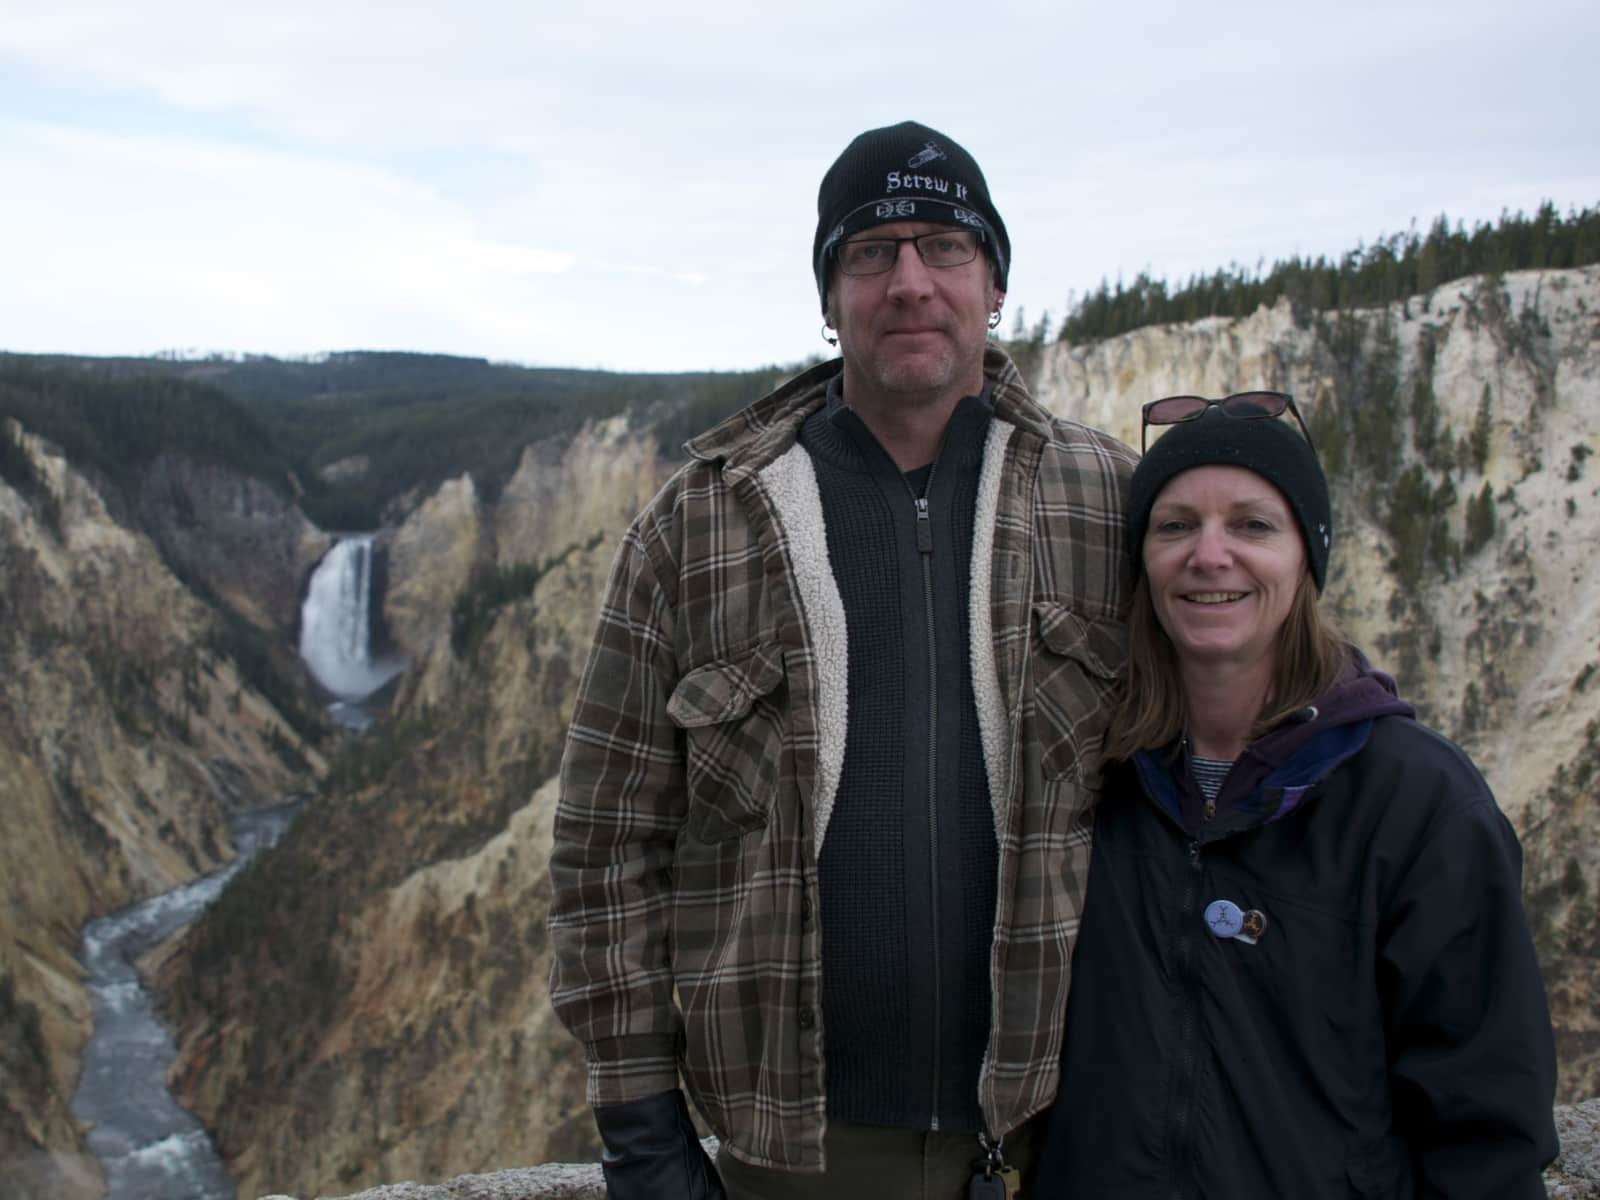 Angelina & William from Kamloops, British Columbia, Canada